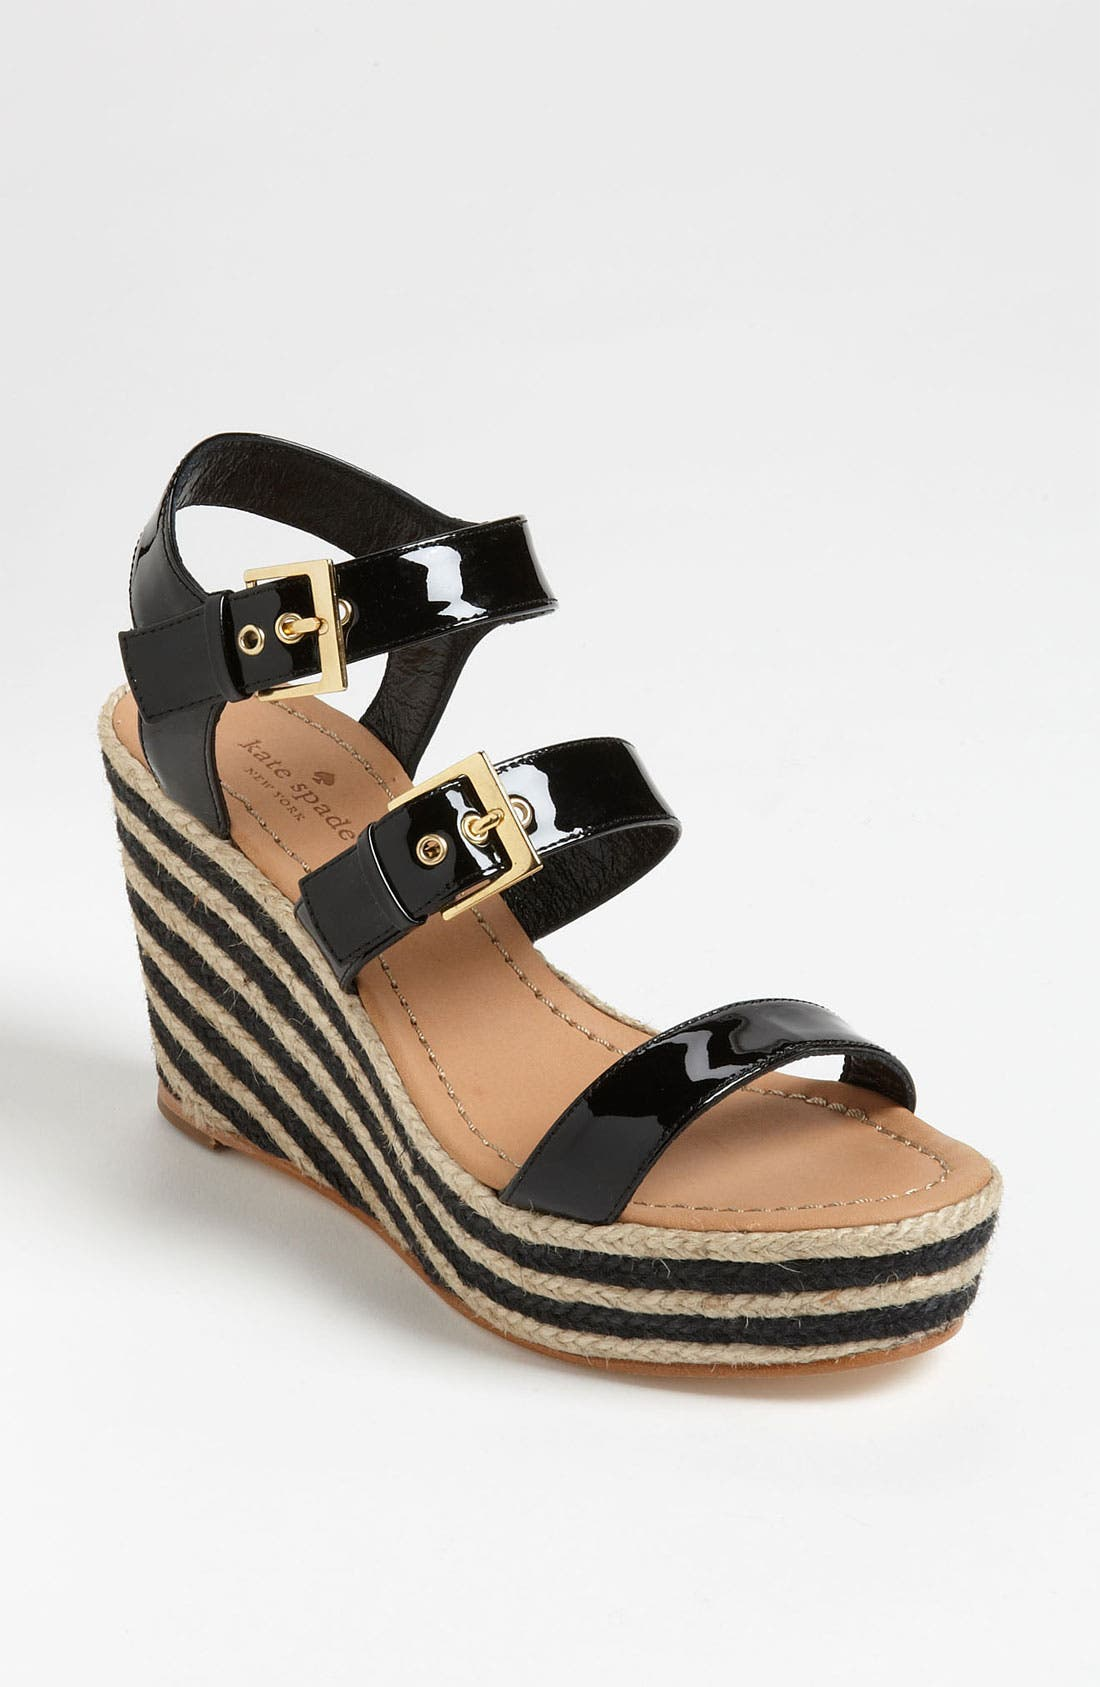 Alternate Image 1 Selected - kate spade new york 'darla' sandal